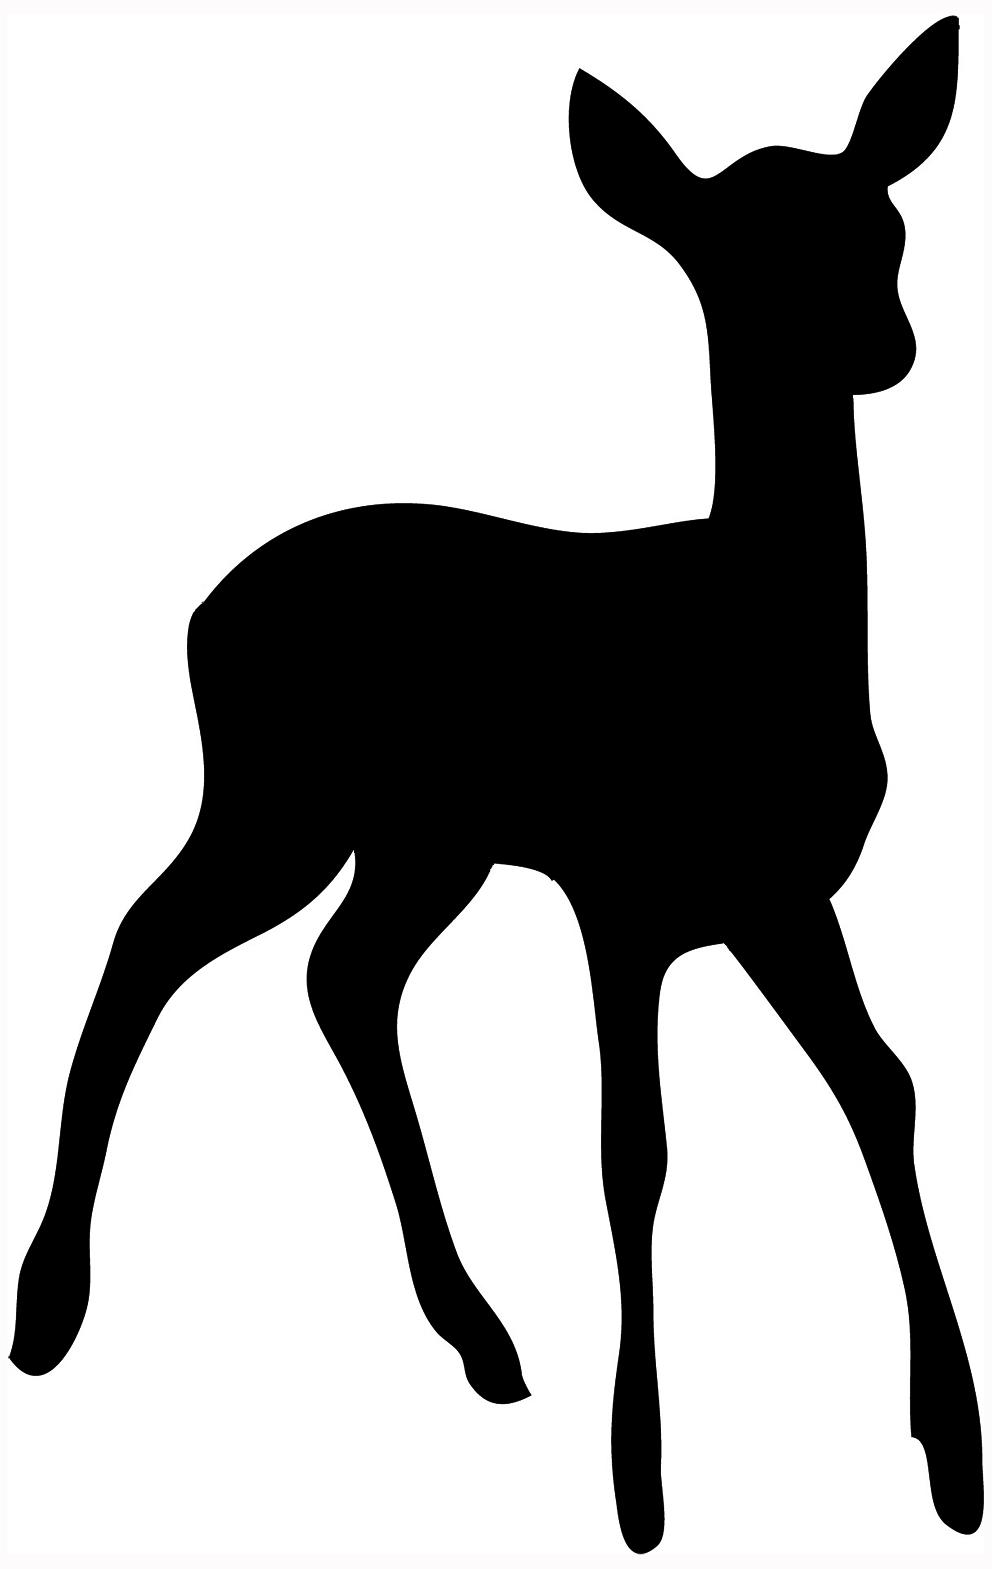 992x1569 Baby Deer Silhouette Clip Art Clipart Panda